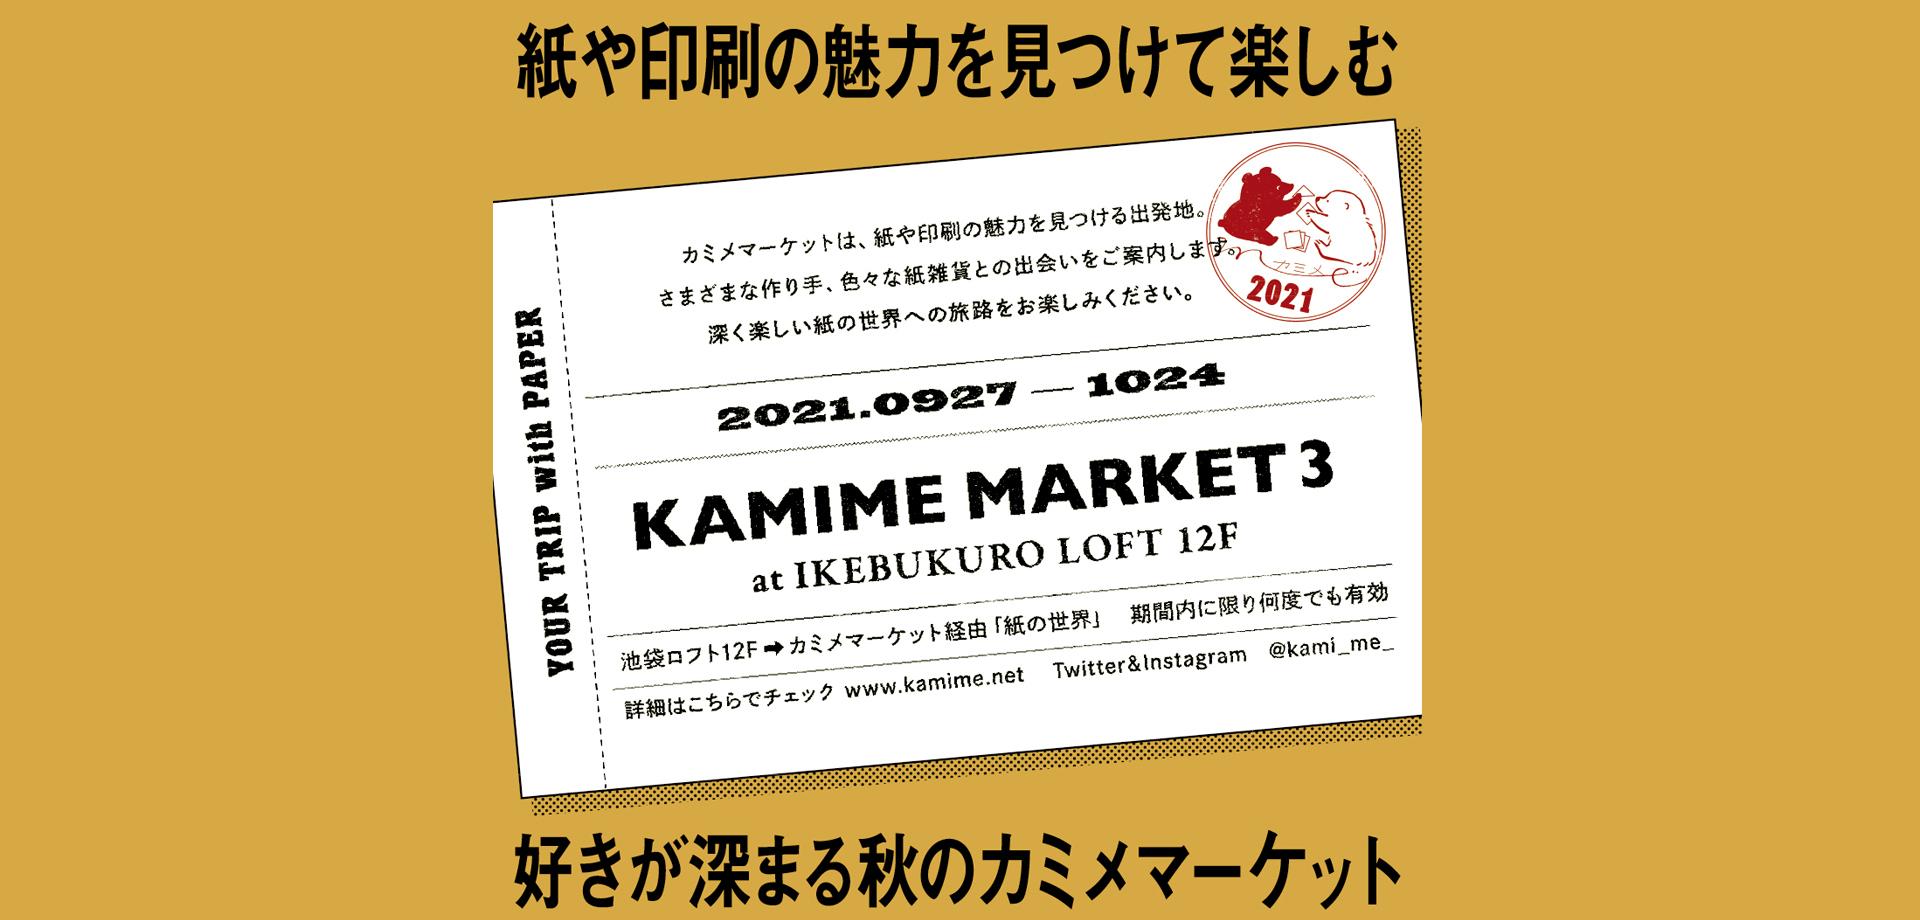 「KAMIME MARKET vol.3」池袋ロフト